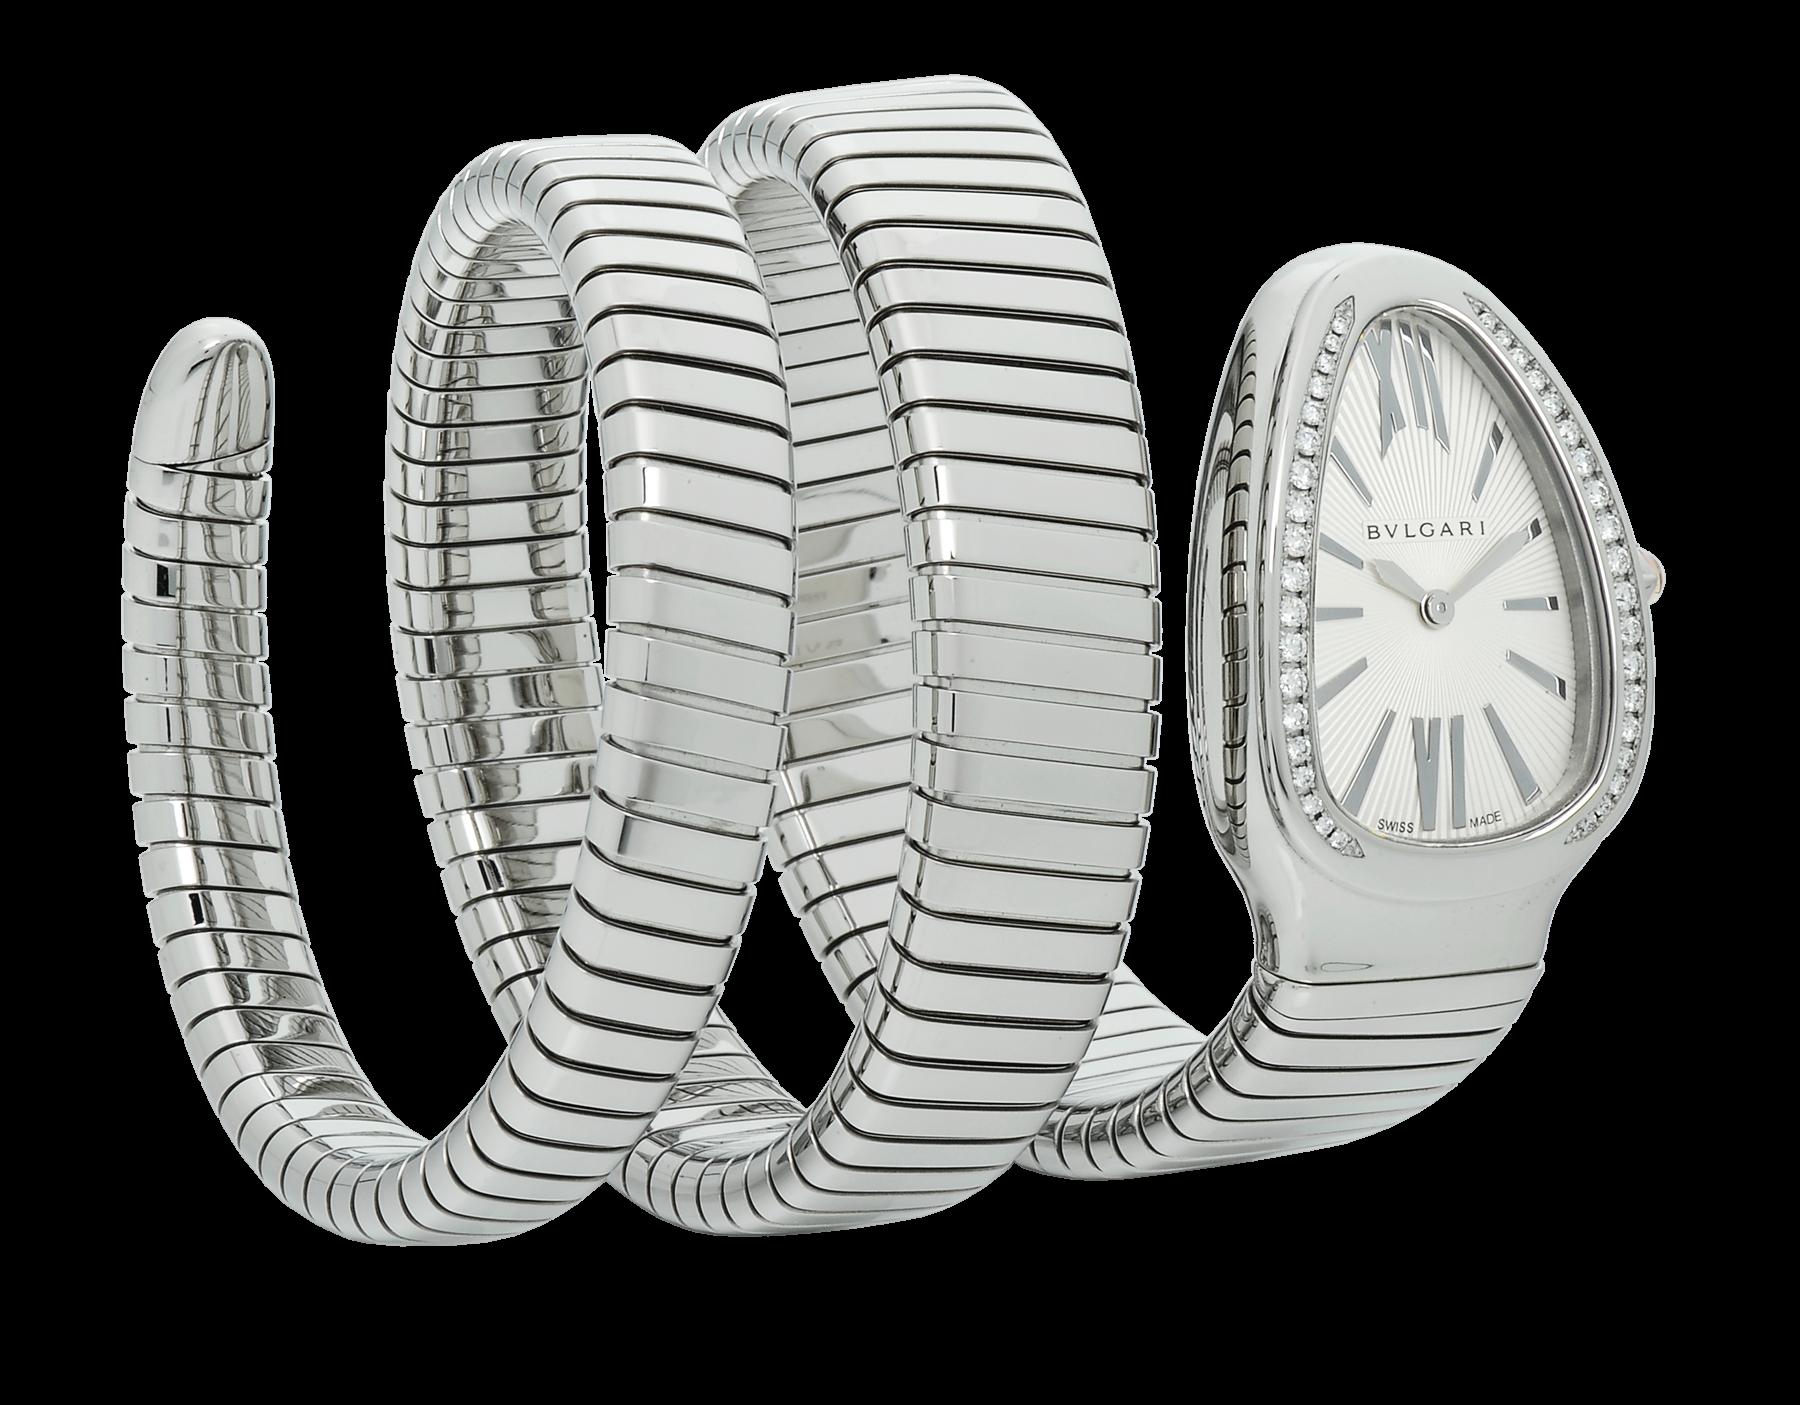 Relógios de luxo Bulgari   Serpenti Tubogas   Joias em 2019 ... ce07775907